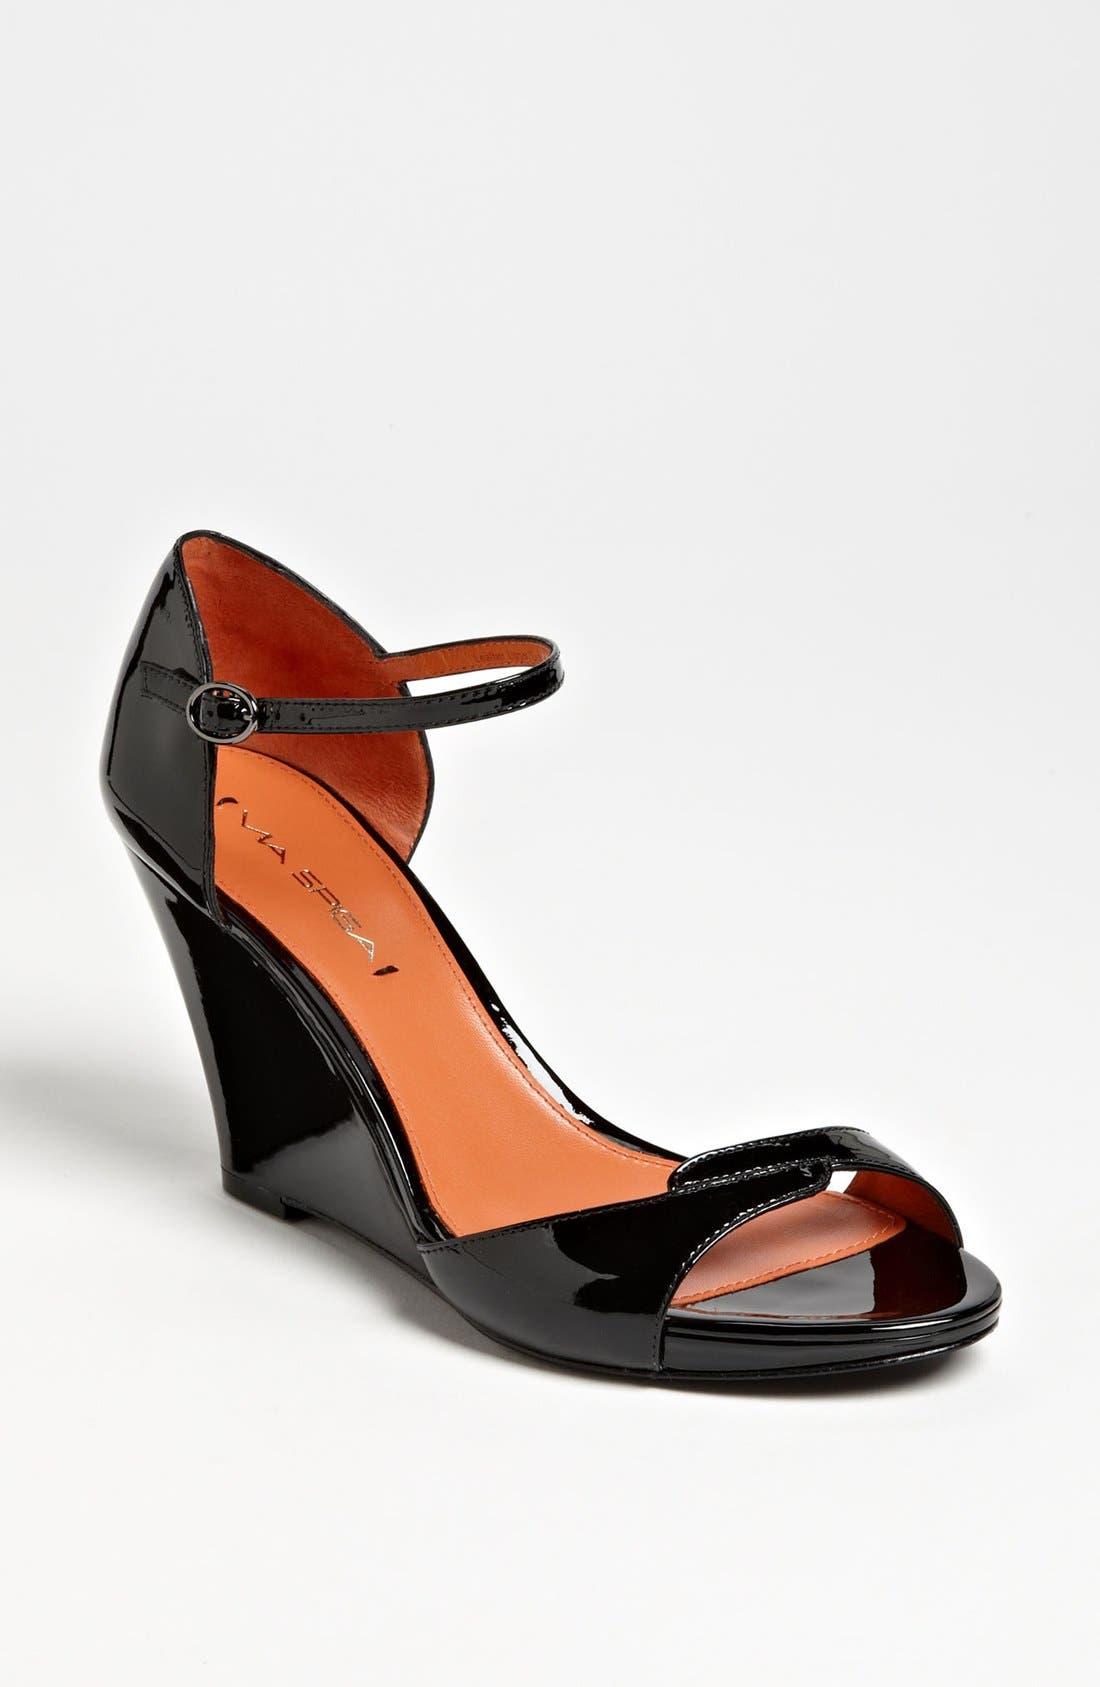 Main Image - Via Spiga 'Danice' Wedge Sandal